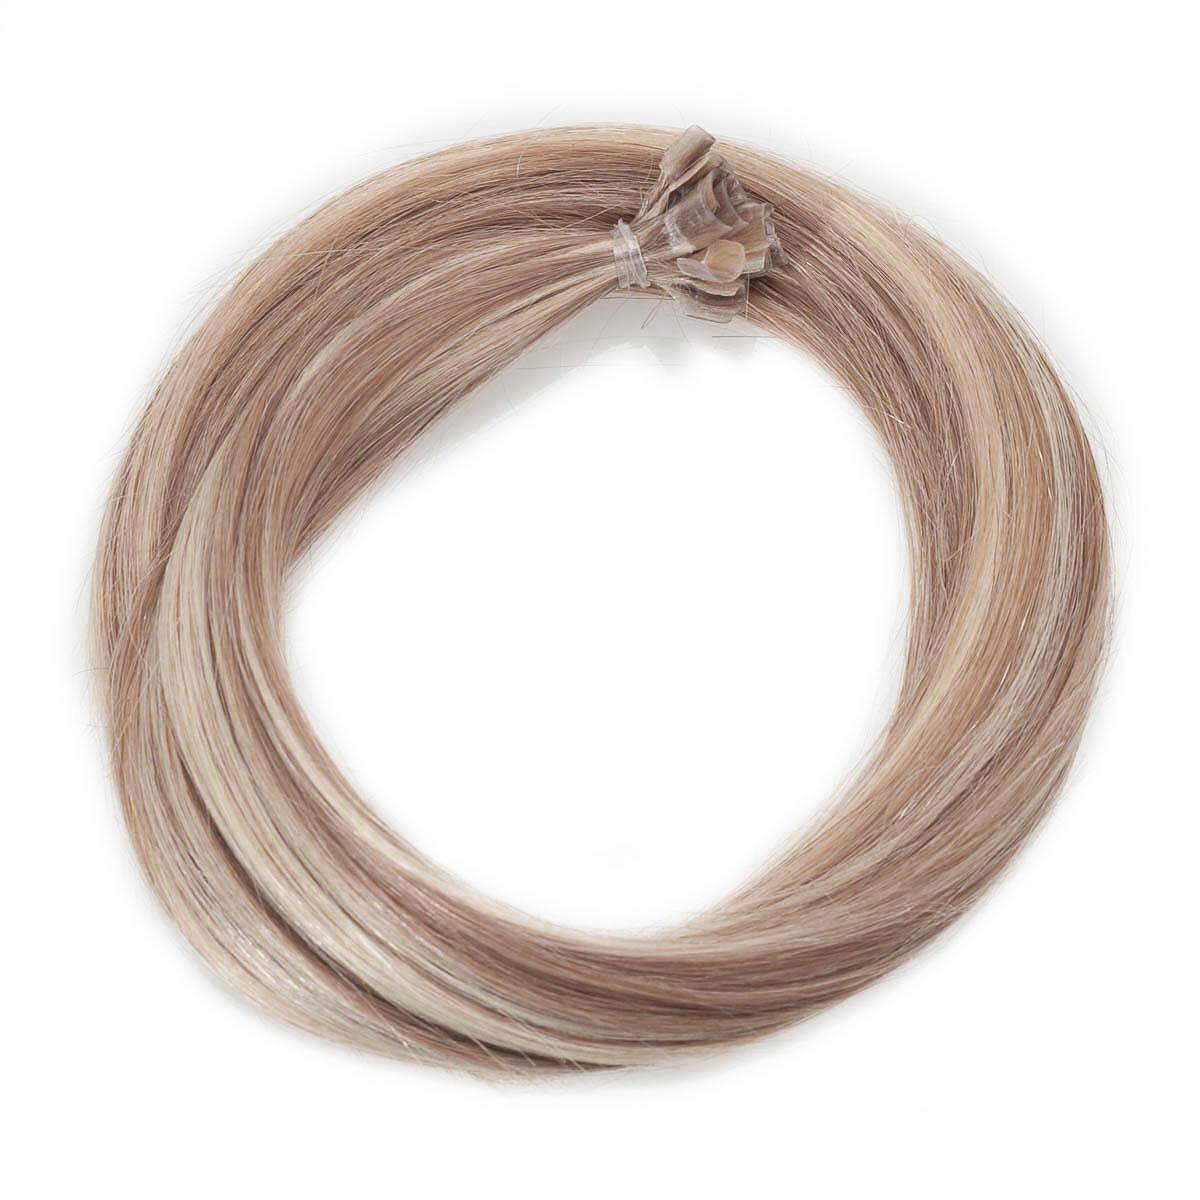 Nail Hair Premium M7.3/10.8 Cendre Ash Blonde Mix 60 cm